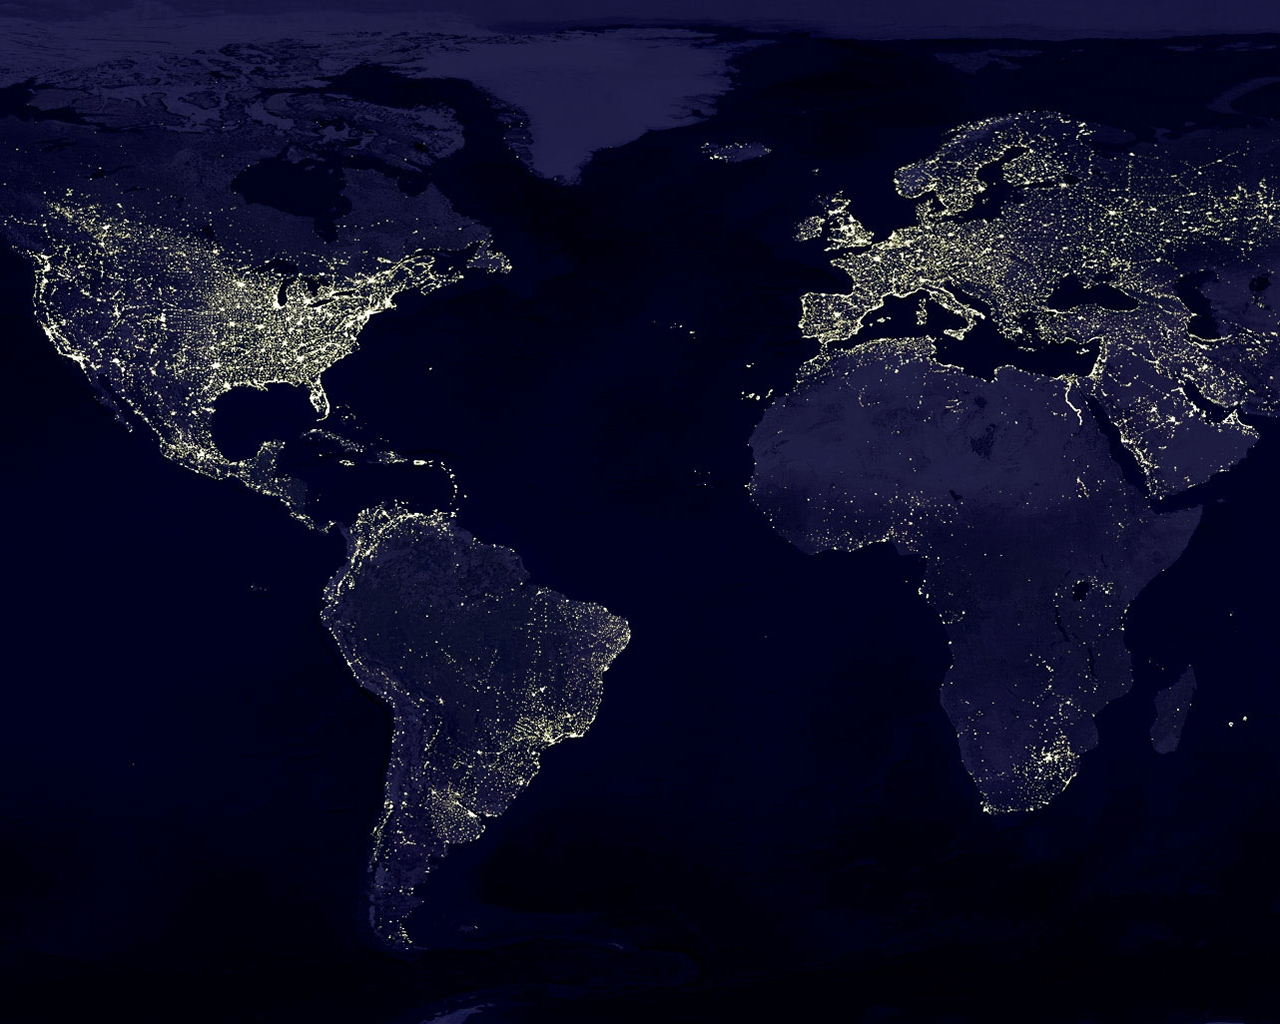 40 Earth At Night Wallpaper Hd On Wallpapersafari